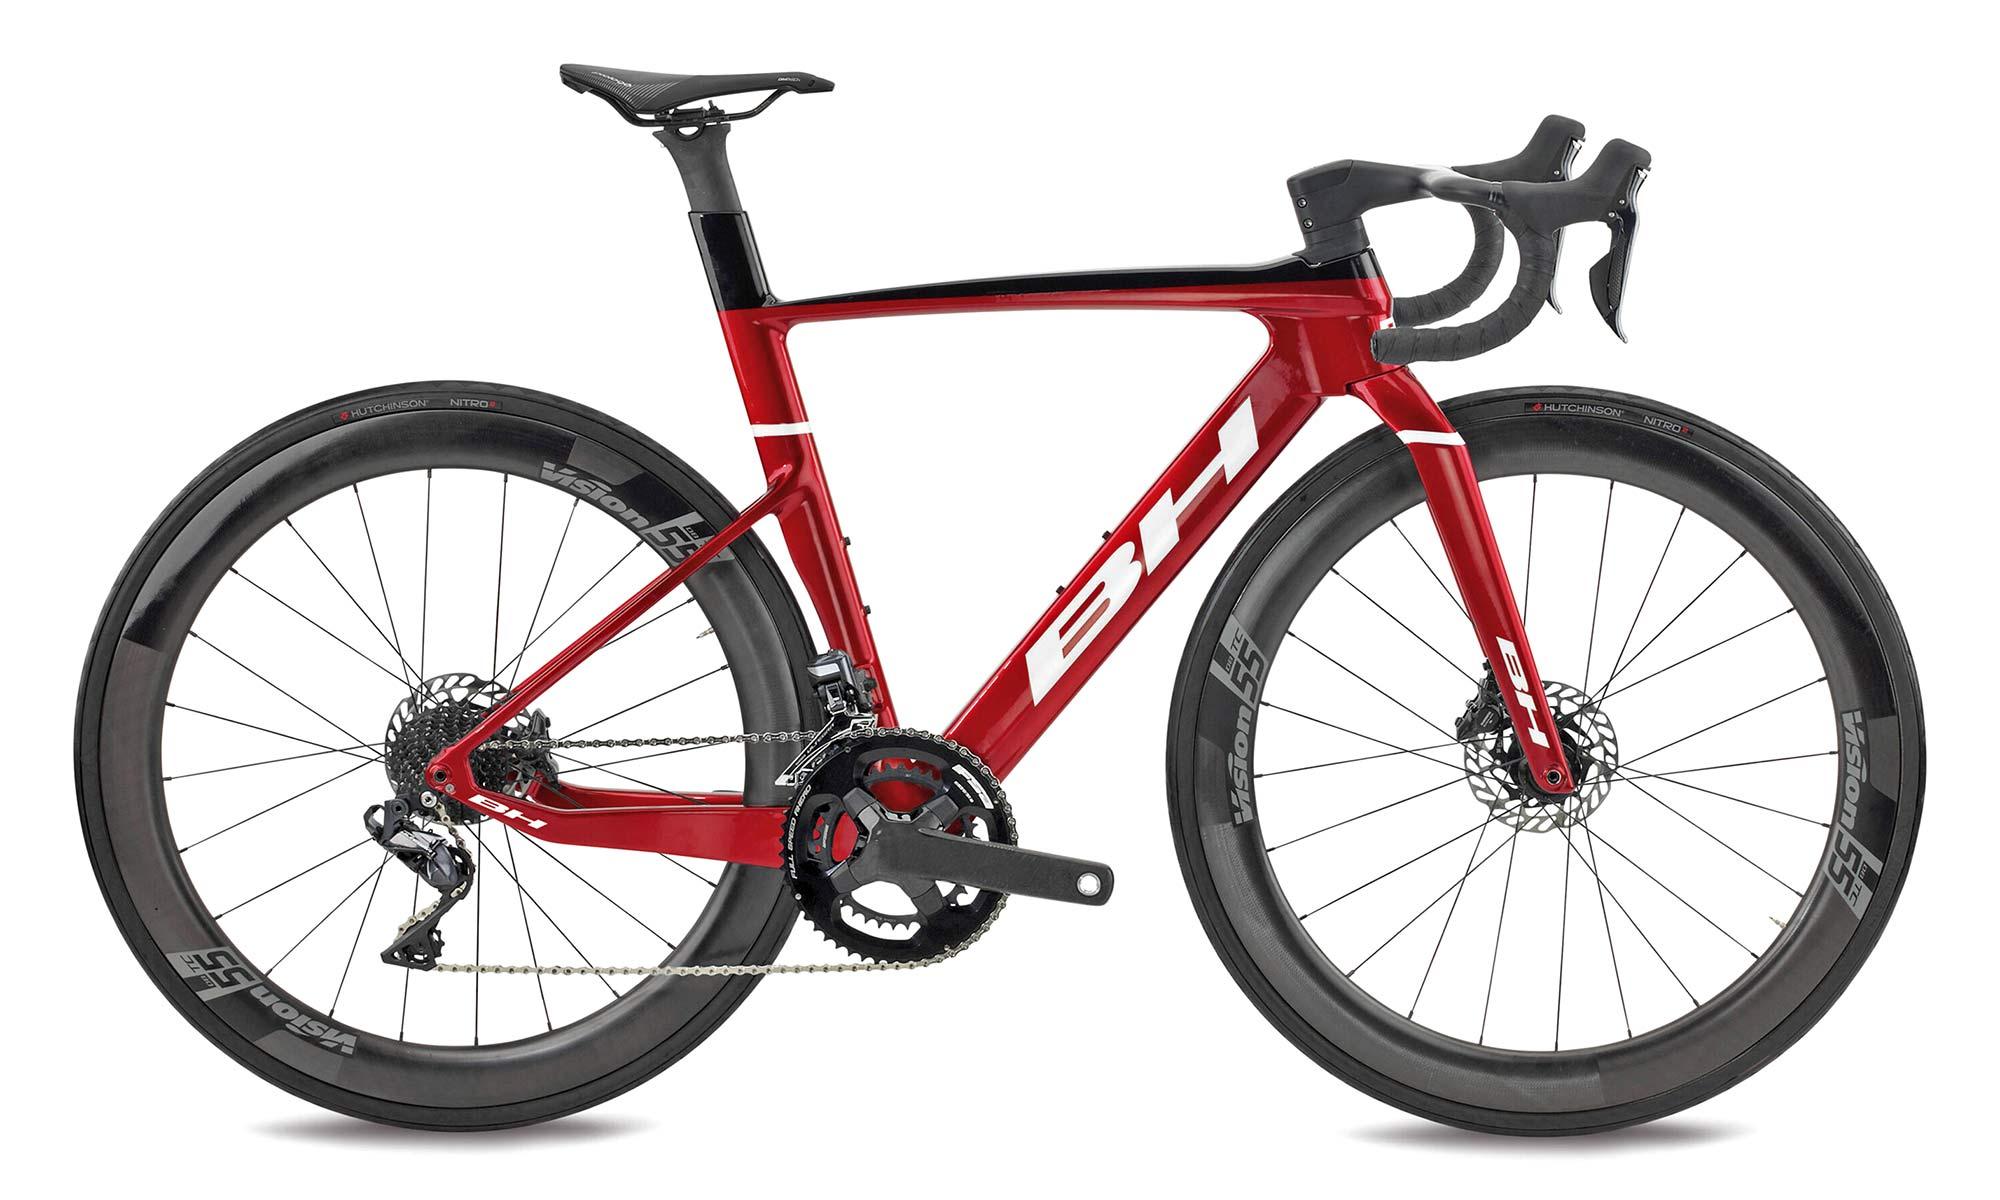 2022 BH Aerolight lightweight aero carbon all-rounder road bike,6.5 complete